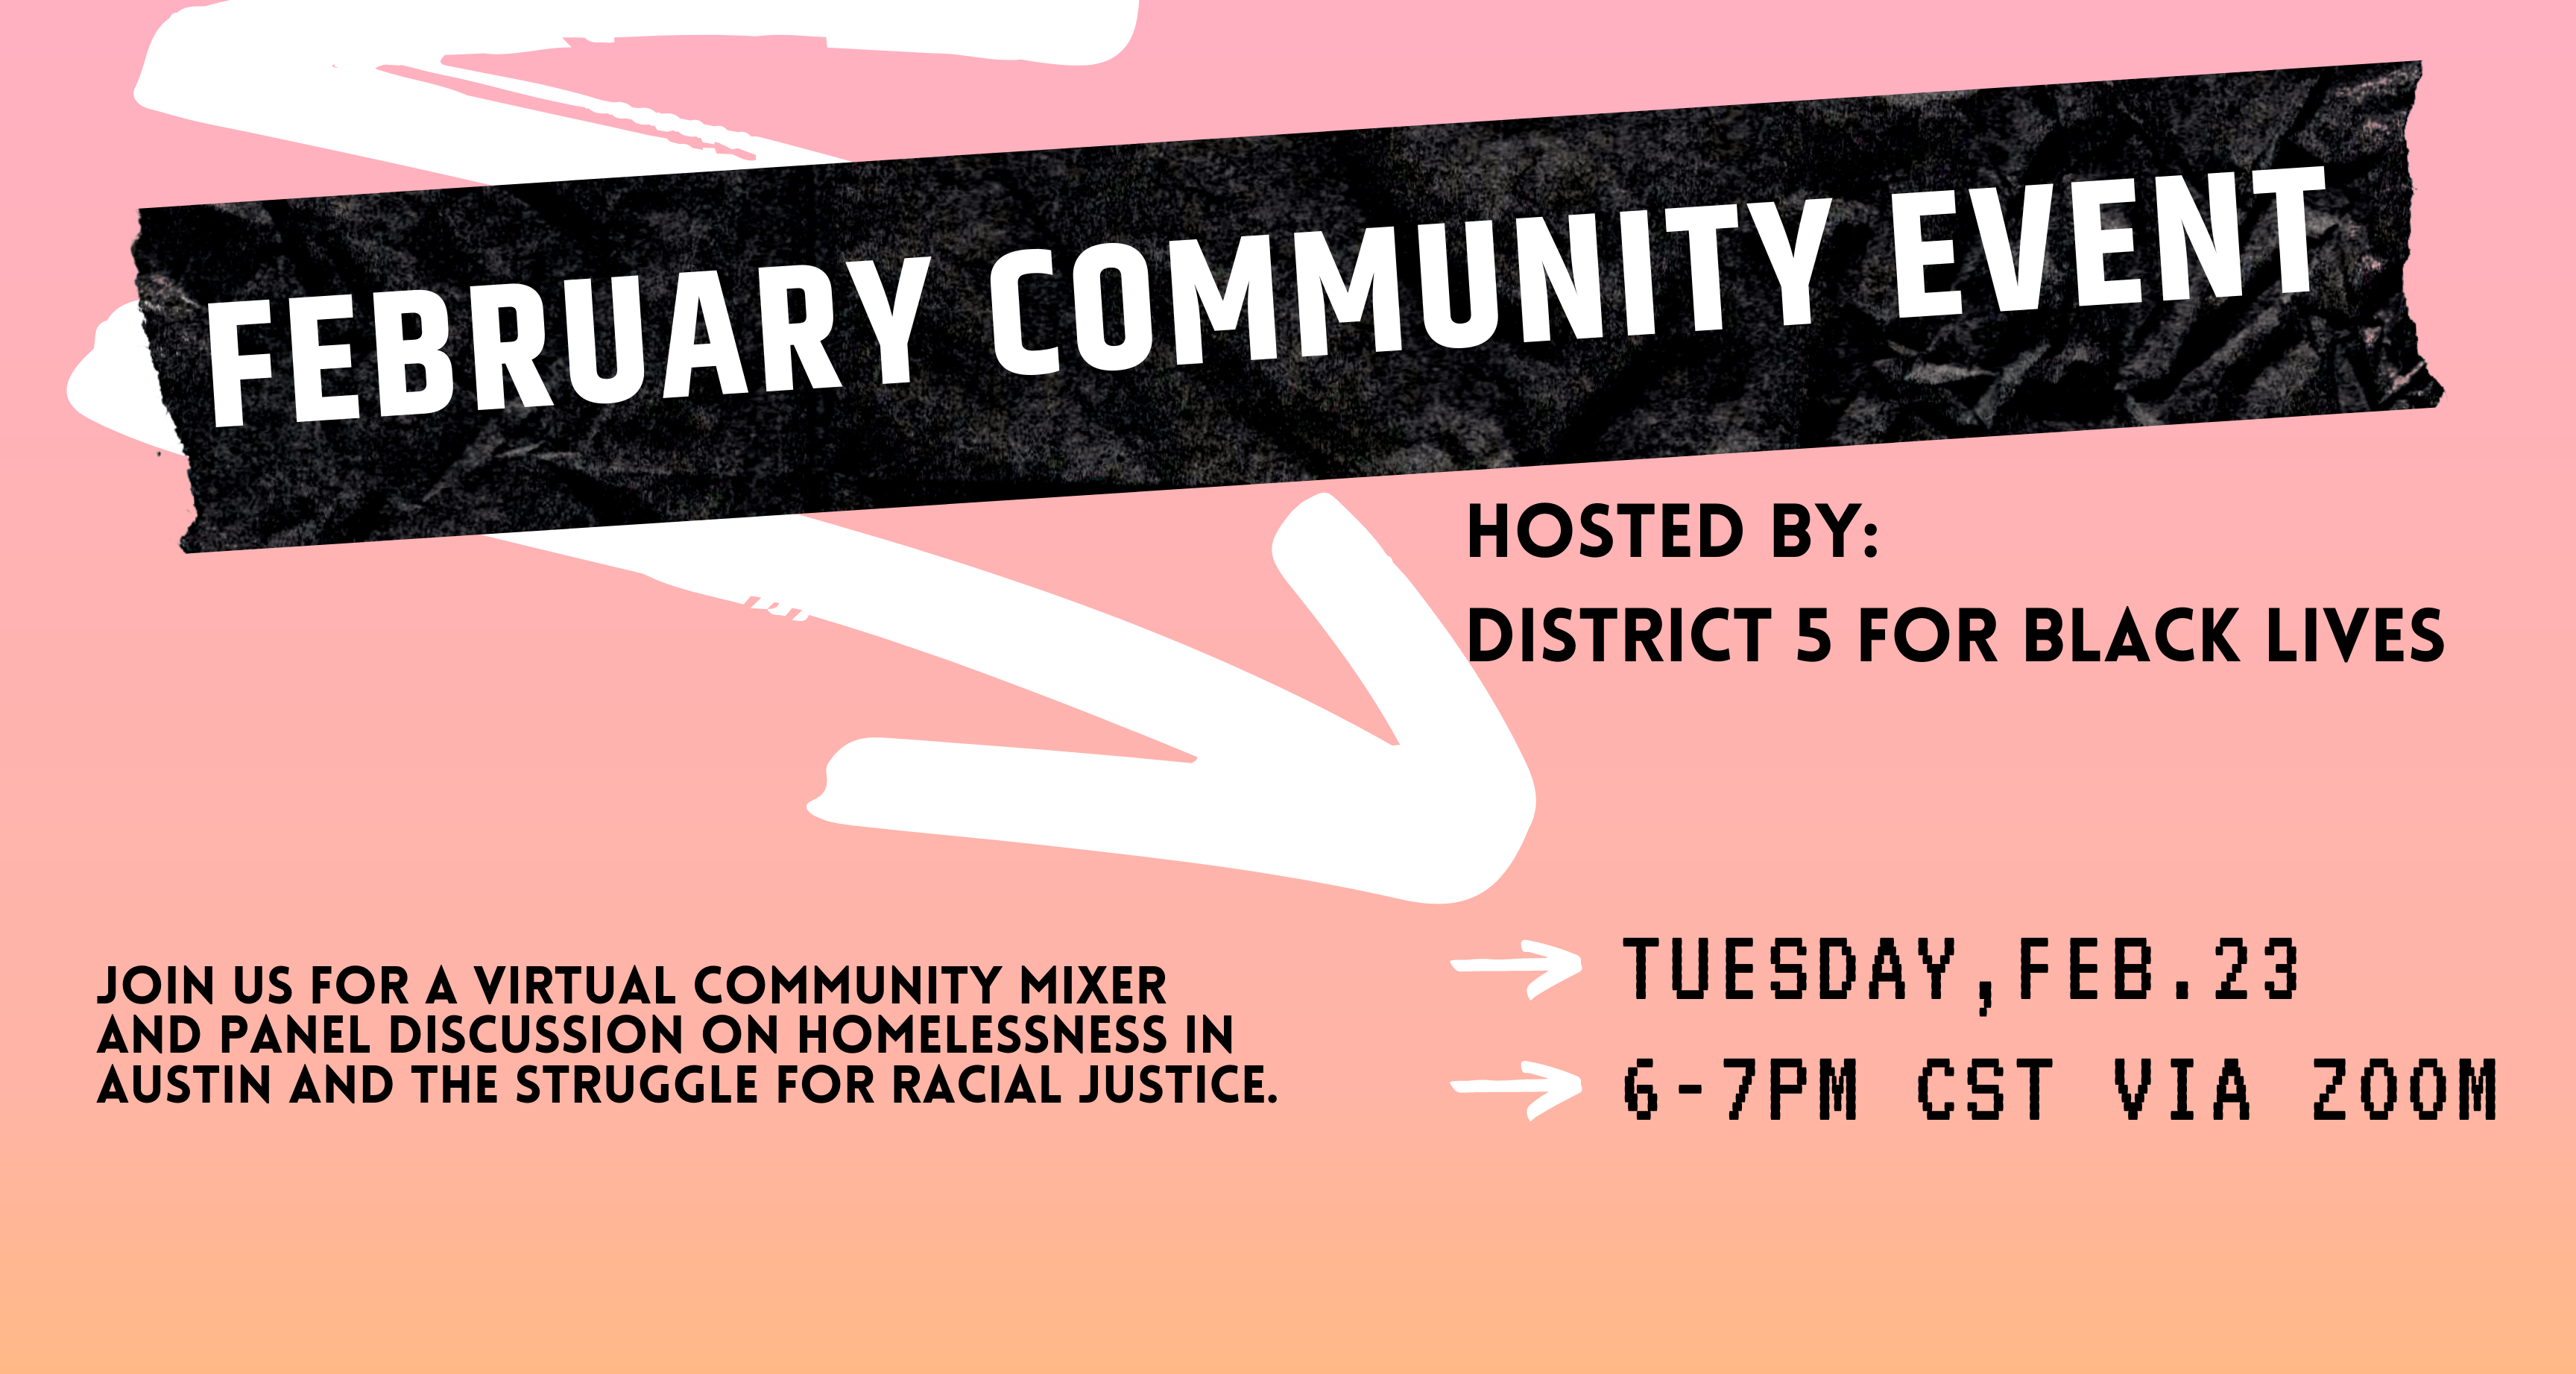 February Community Event Details